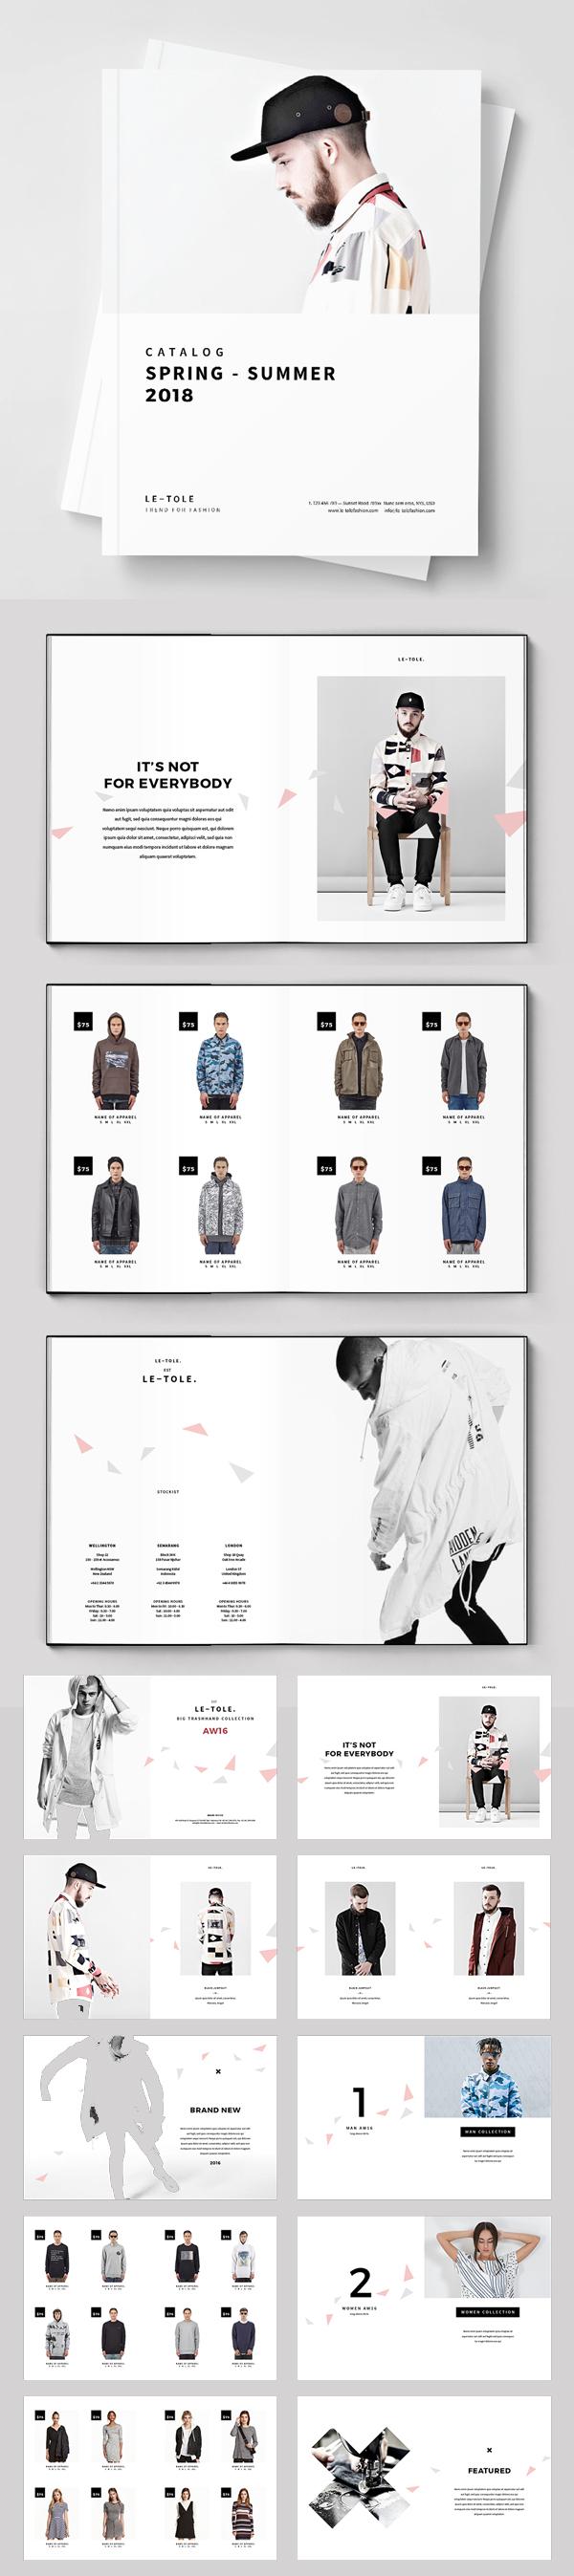 100 Professional Corporate Brochure Templates - 14